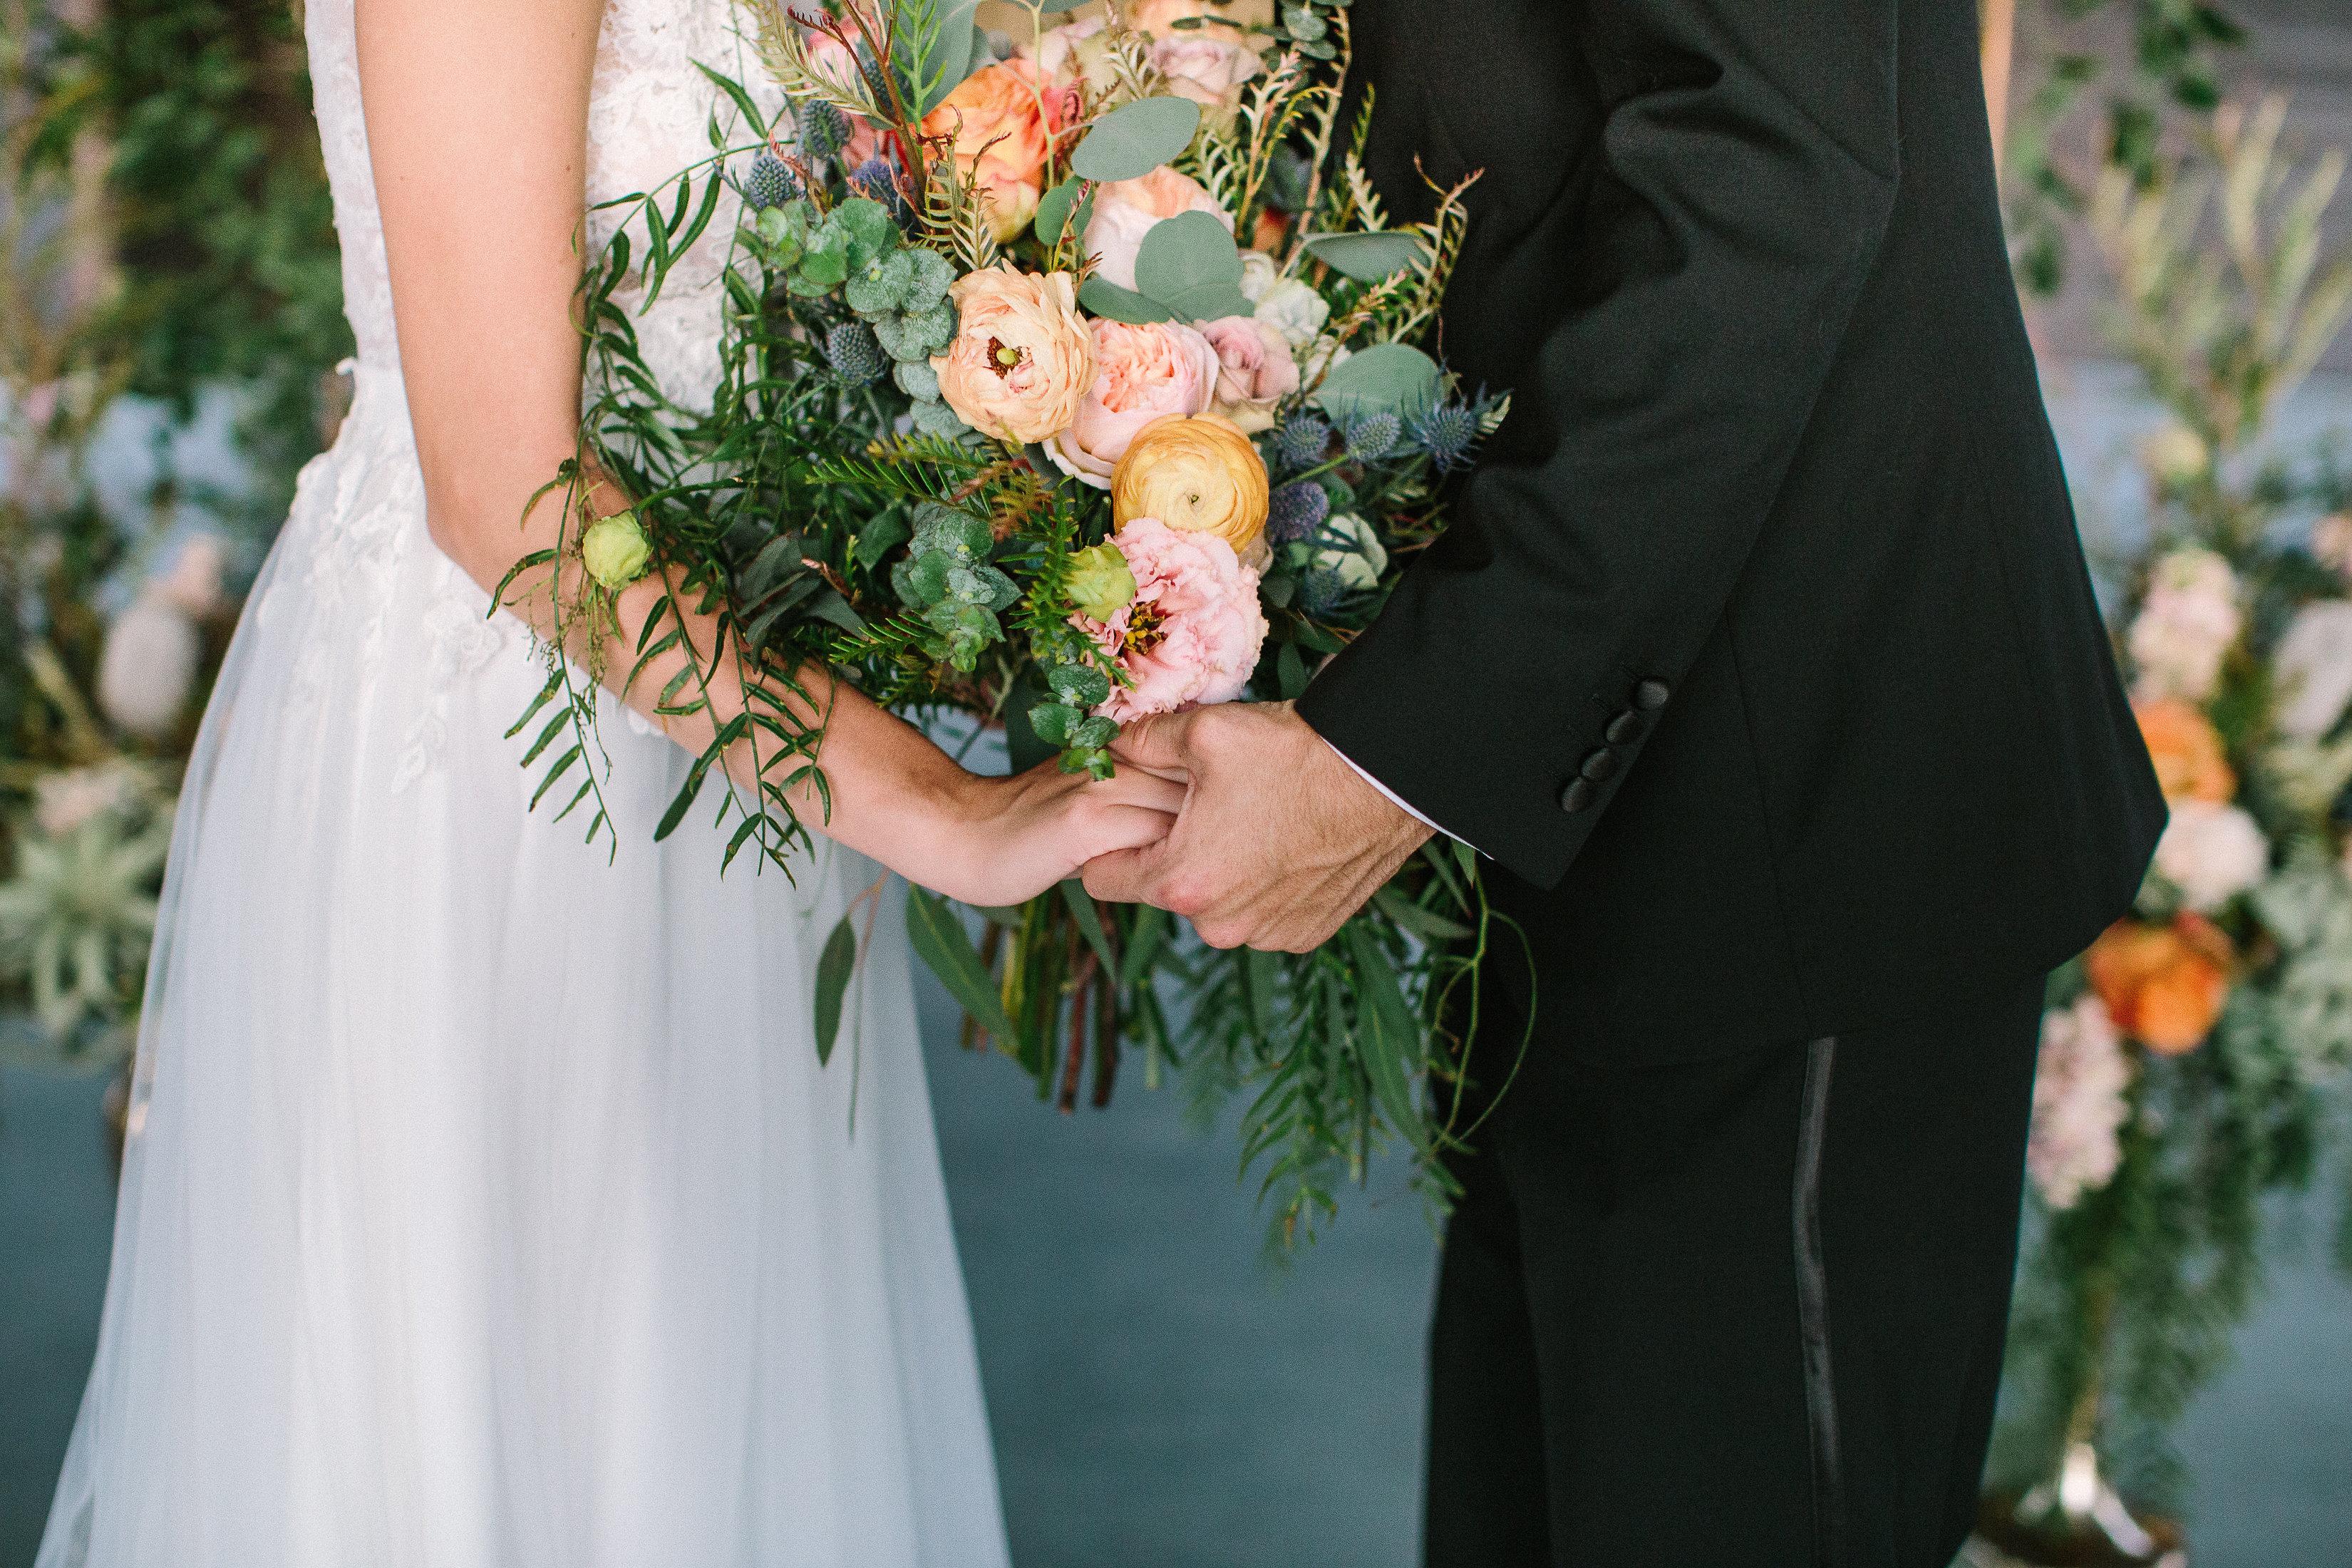 Ellen-Ashton-Photography-Peach-Creek-Ranch-Weddings-Wed-and-Prosper381